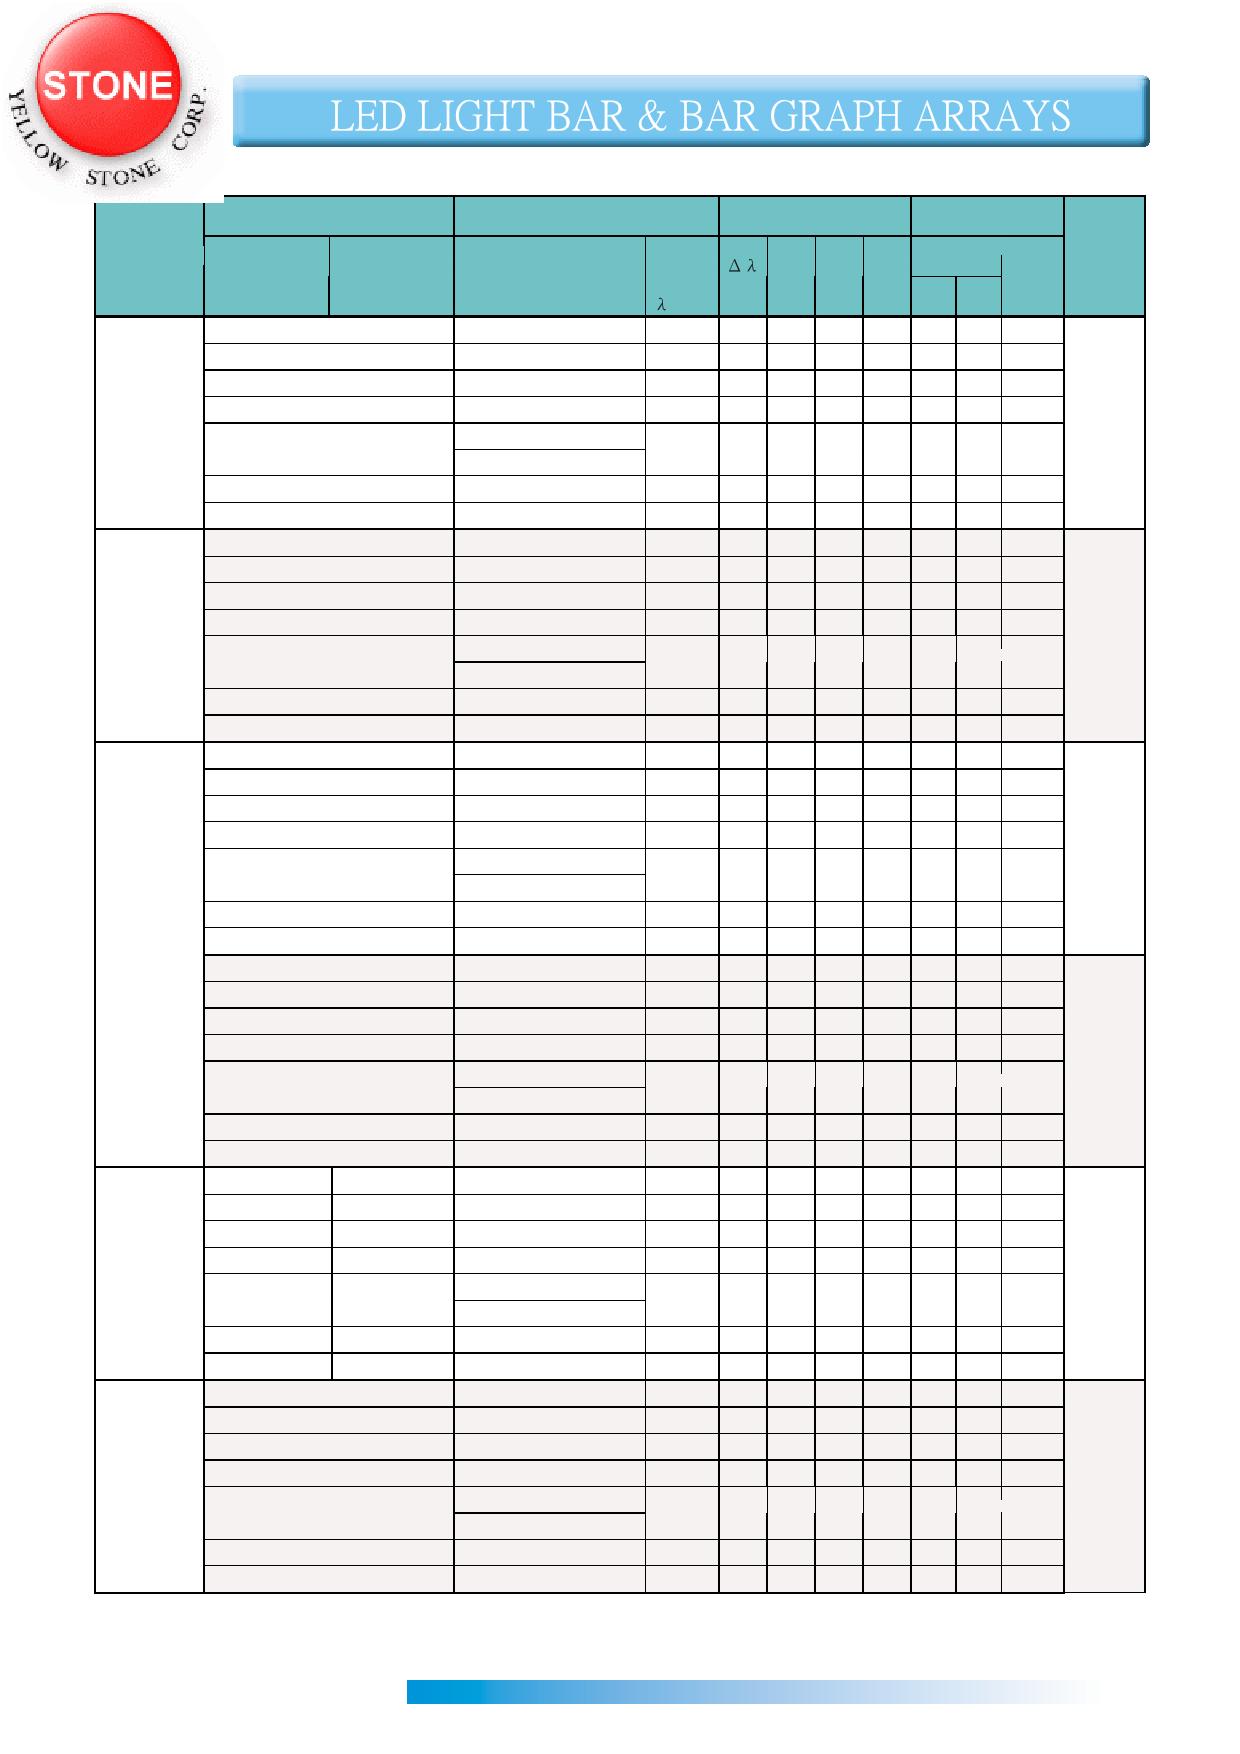 BA-9D4CD datasheet